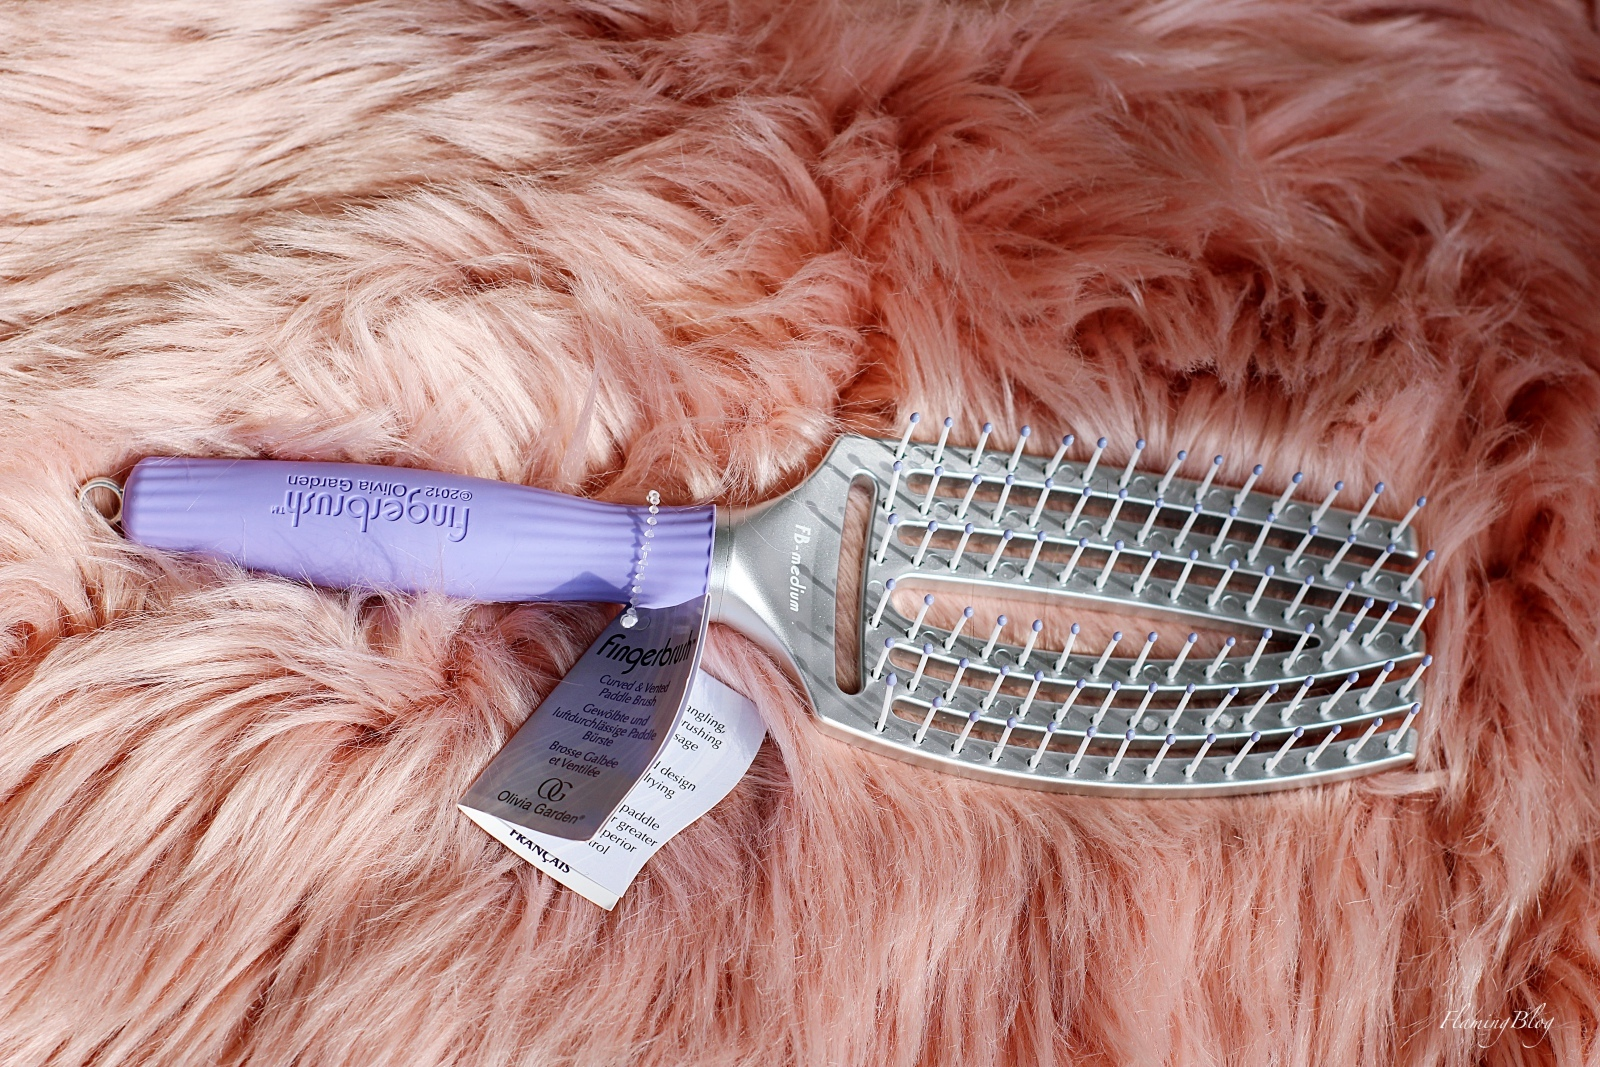 szczotka Olivia Garden fingerbrush opinie blog